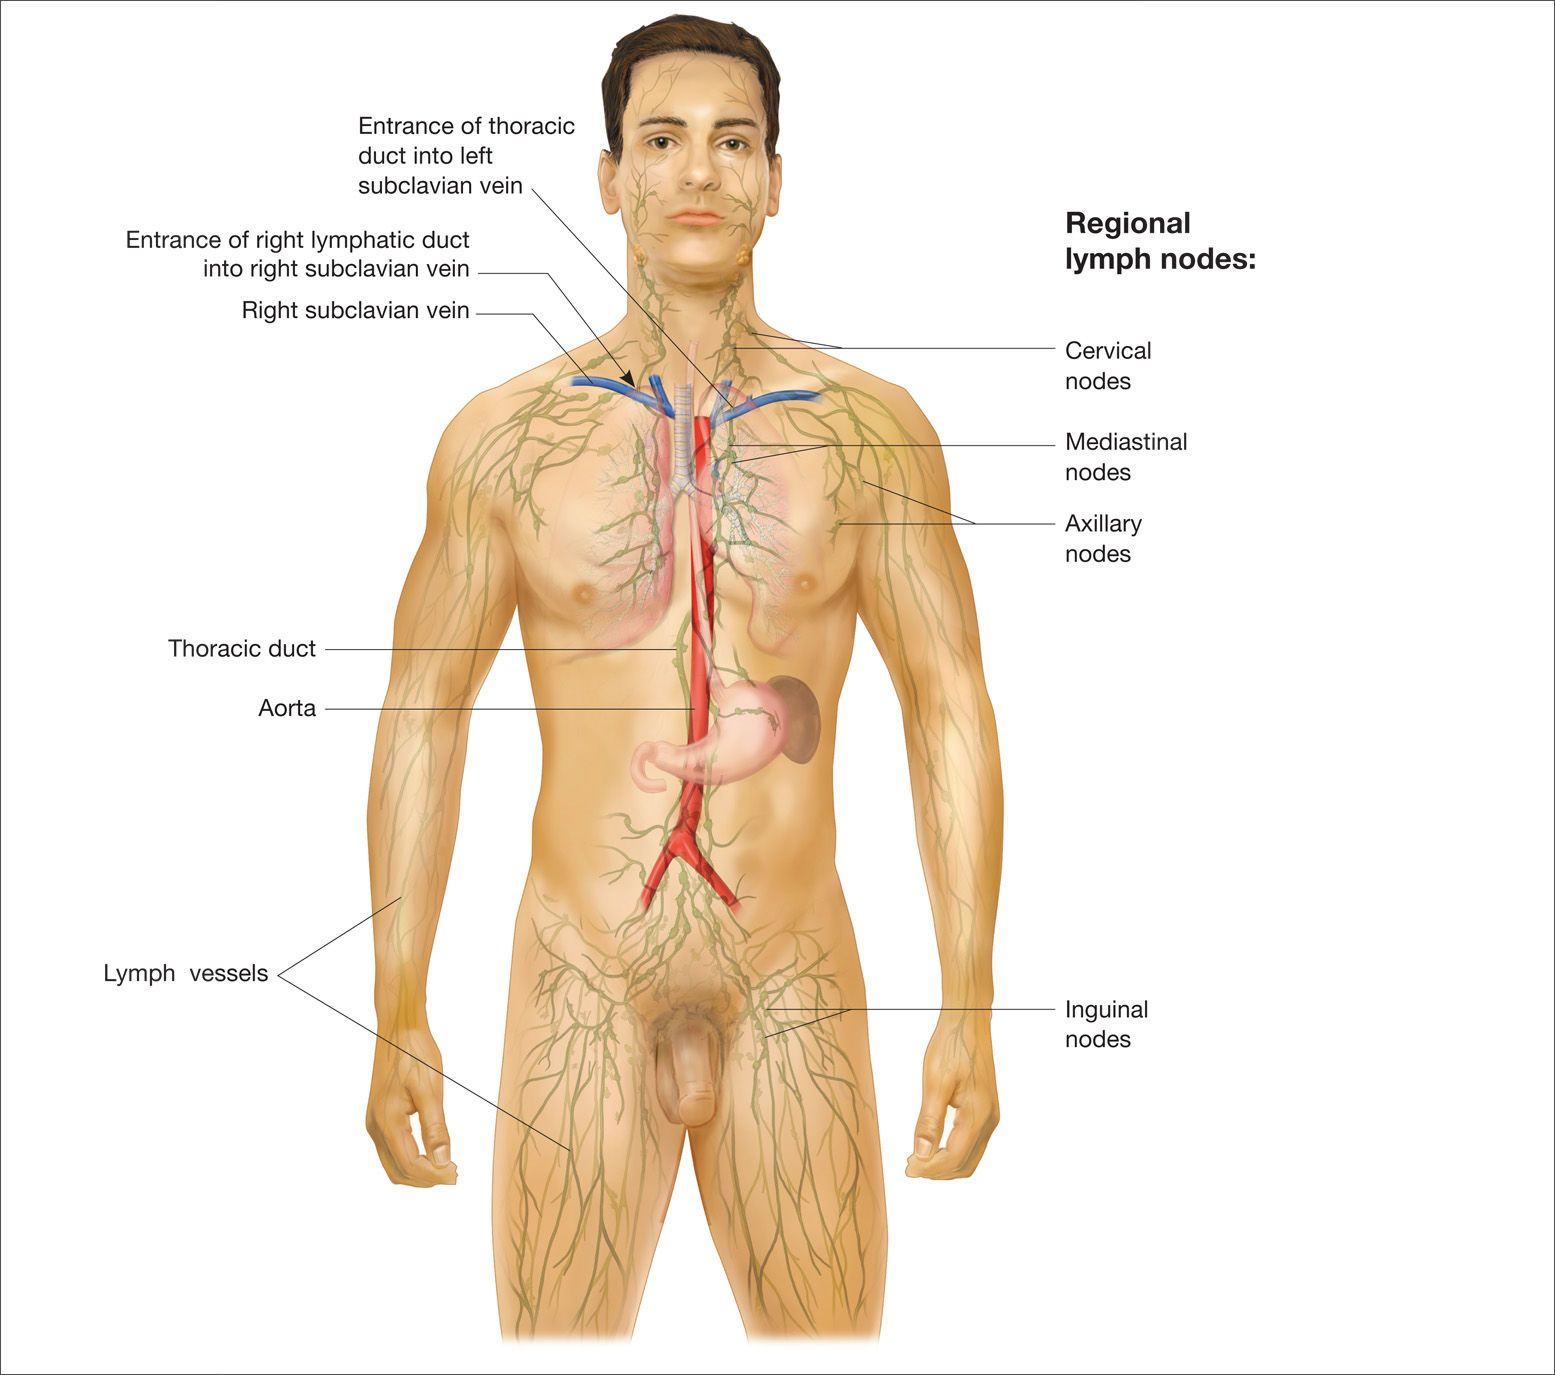 male body diagram wiring diagram page male body diagram labeled [ 1555 x 1375 Pixel ]